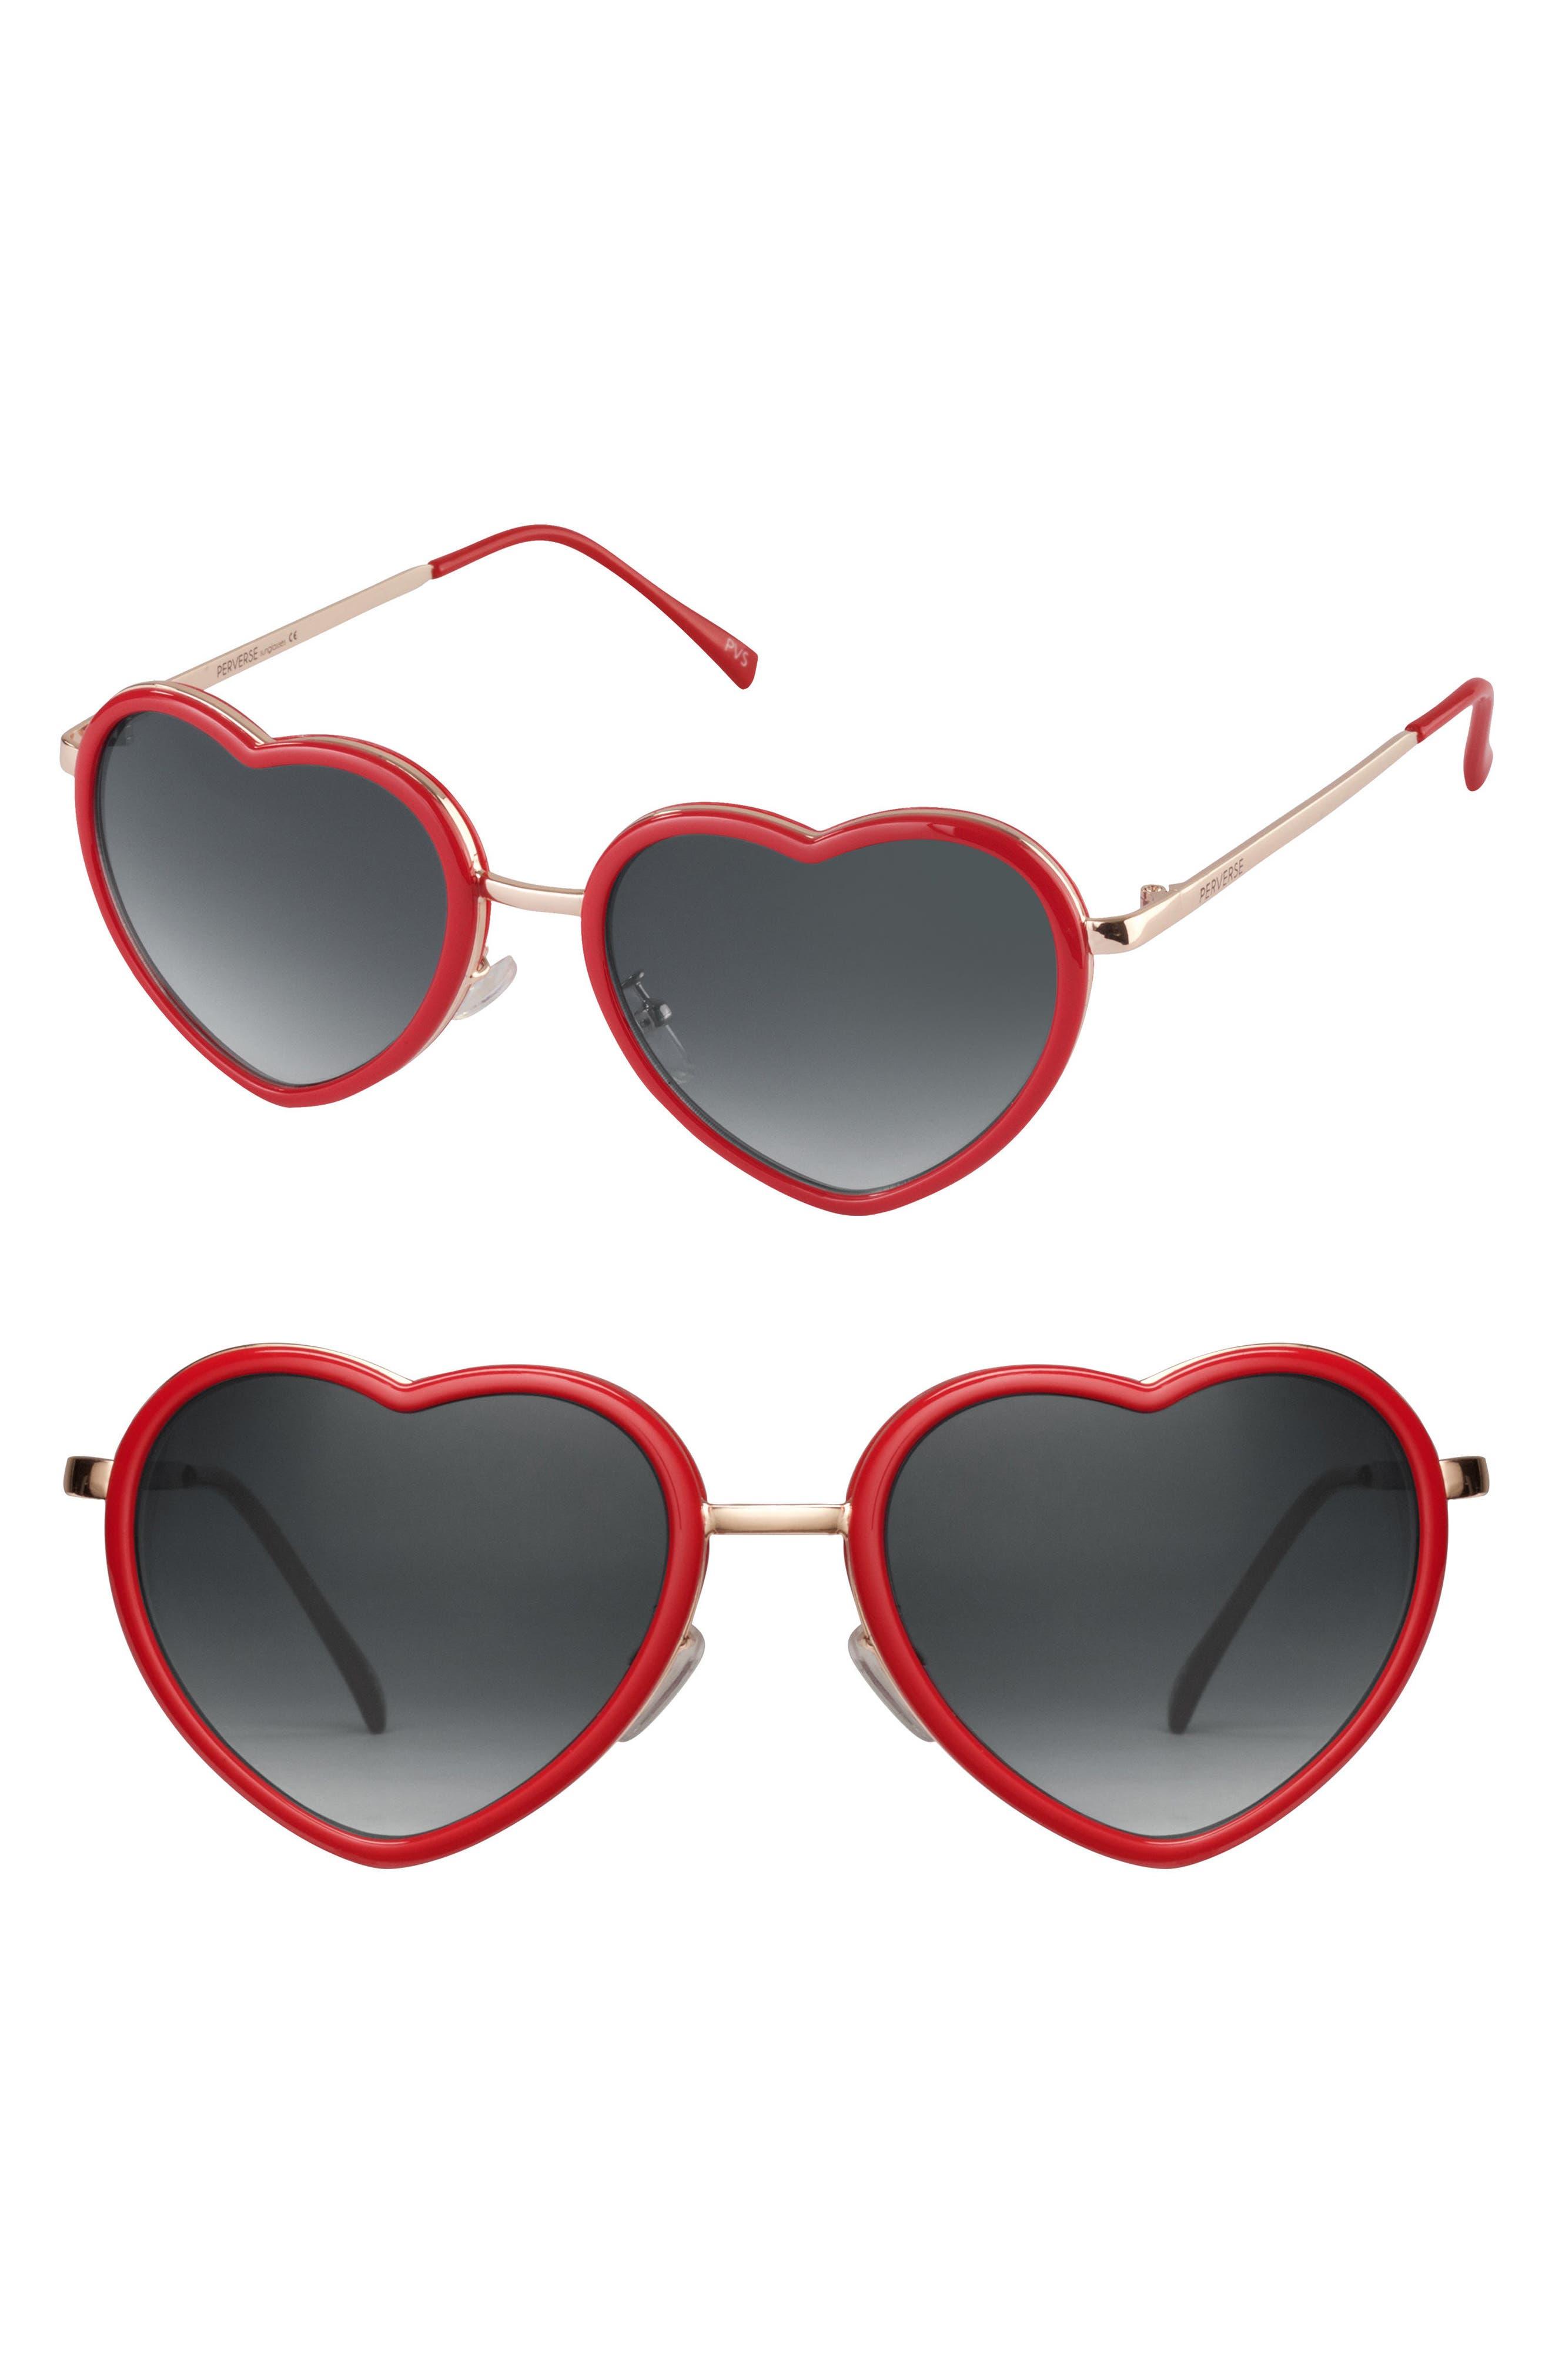 Poipu 52mm Heart Sunglasses,                         Main,                         color, Red/ Black